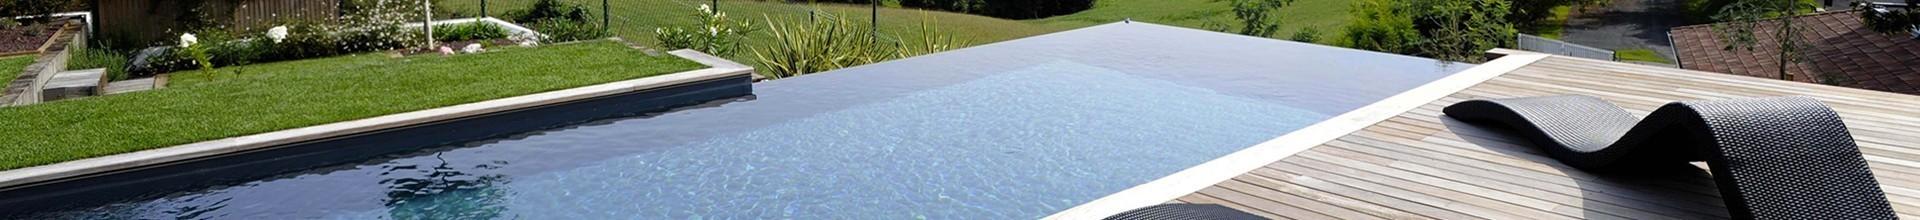 ✅ Rhône Alpes Kit piscine béton Haute Savoie. Fabricant